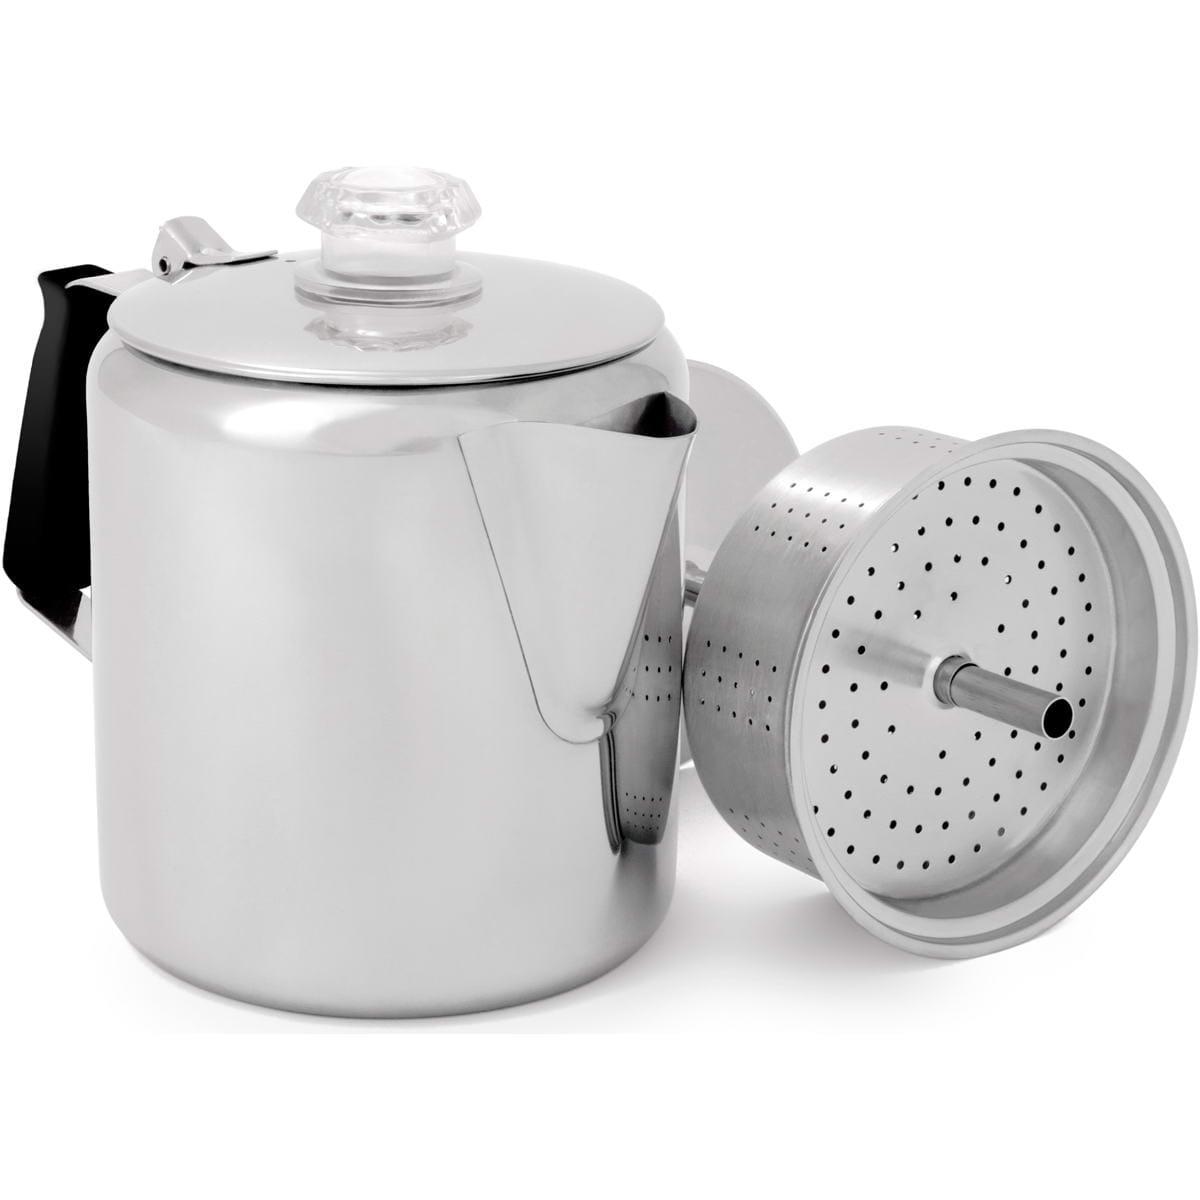 gsi glacier stainless 6 cup percolator kaffee kocher g nstig online kaufen. Black Bedroom Furniture Sets. Home Design Ideas